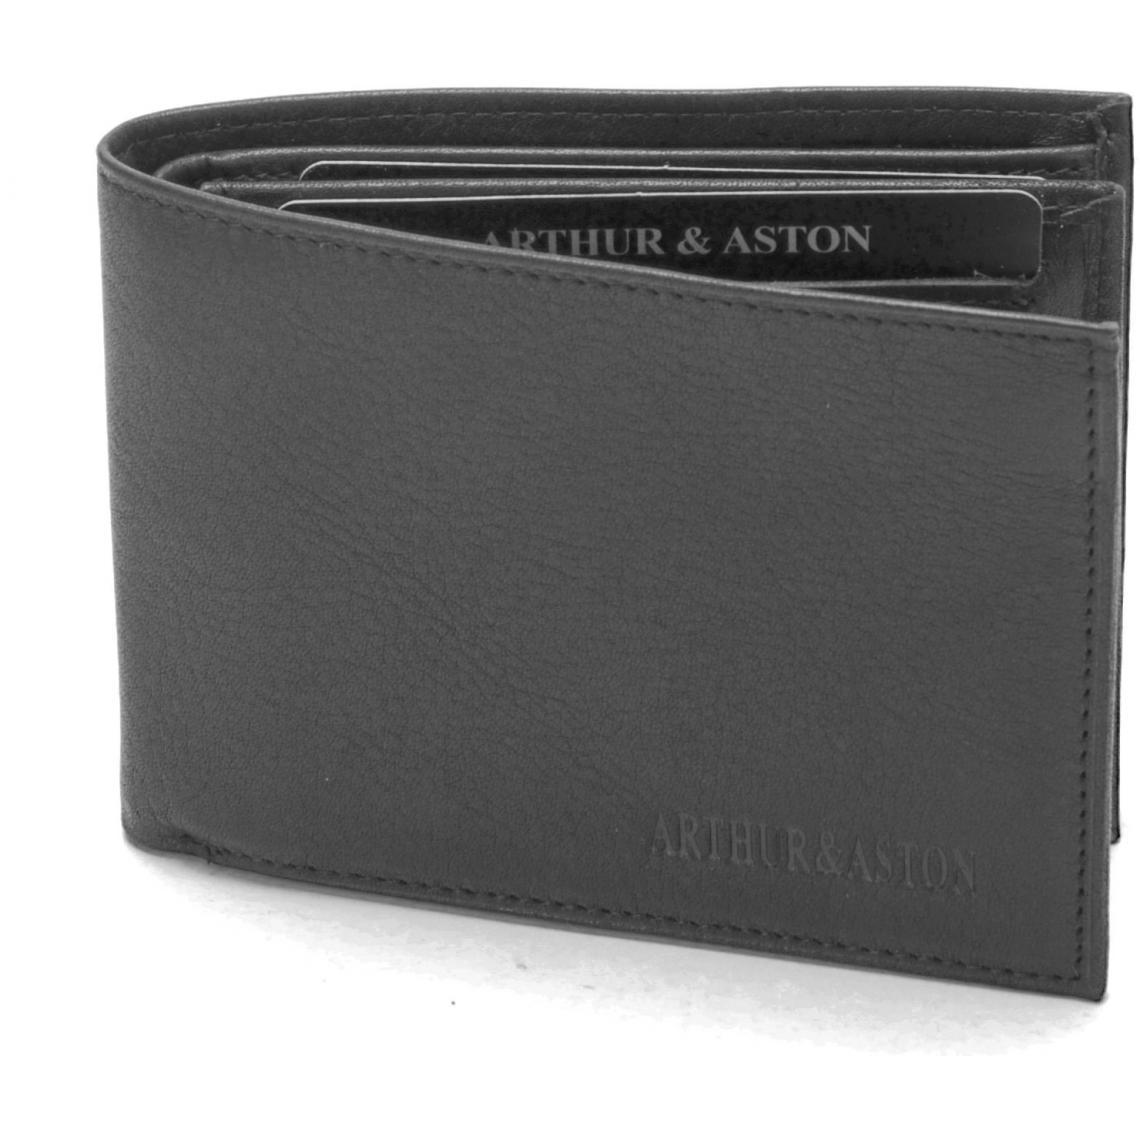 PORTE CARTES DANDY - Cuir - Arthur & Aston - Modalova